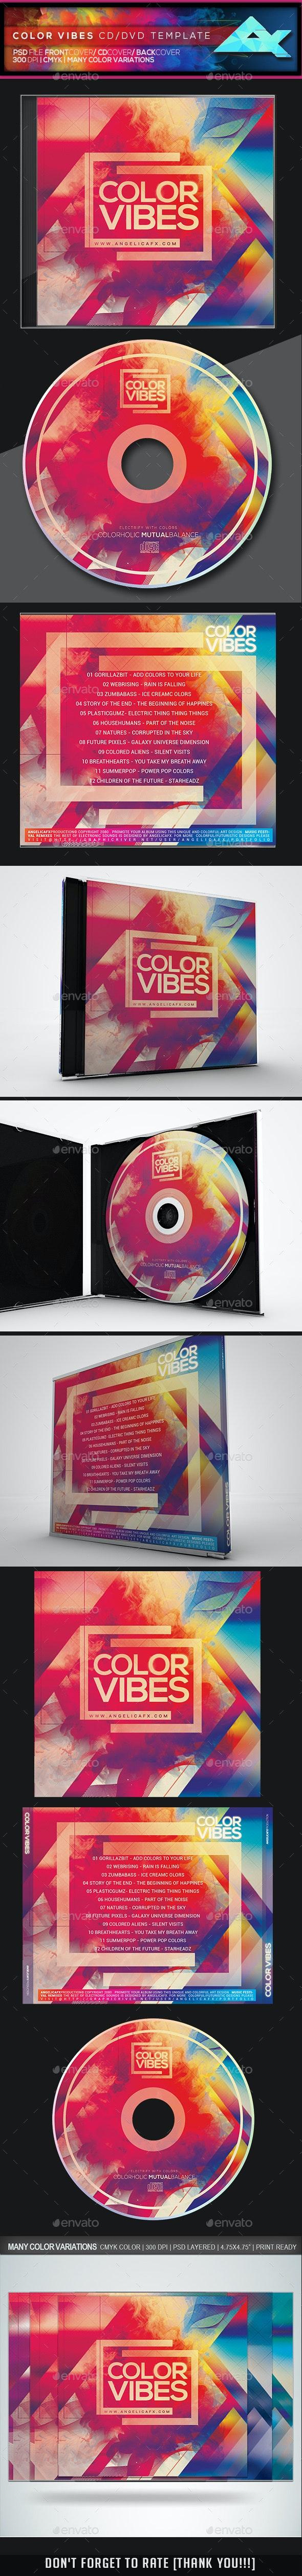 Color Vibes CD/DVD Template - CD & DVD Artwork Print Templates